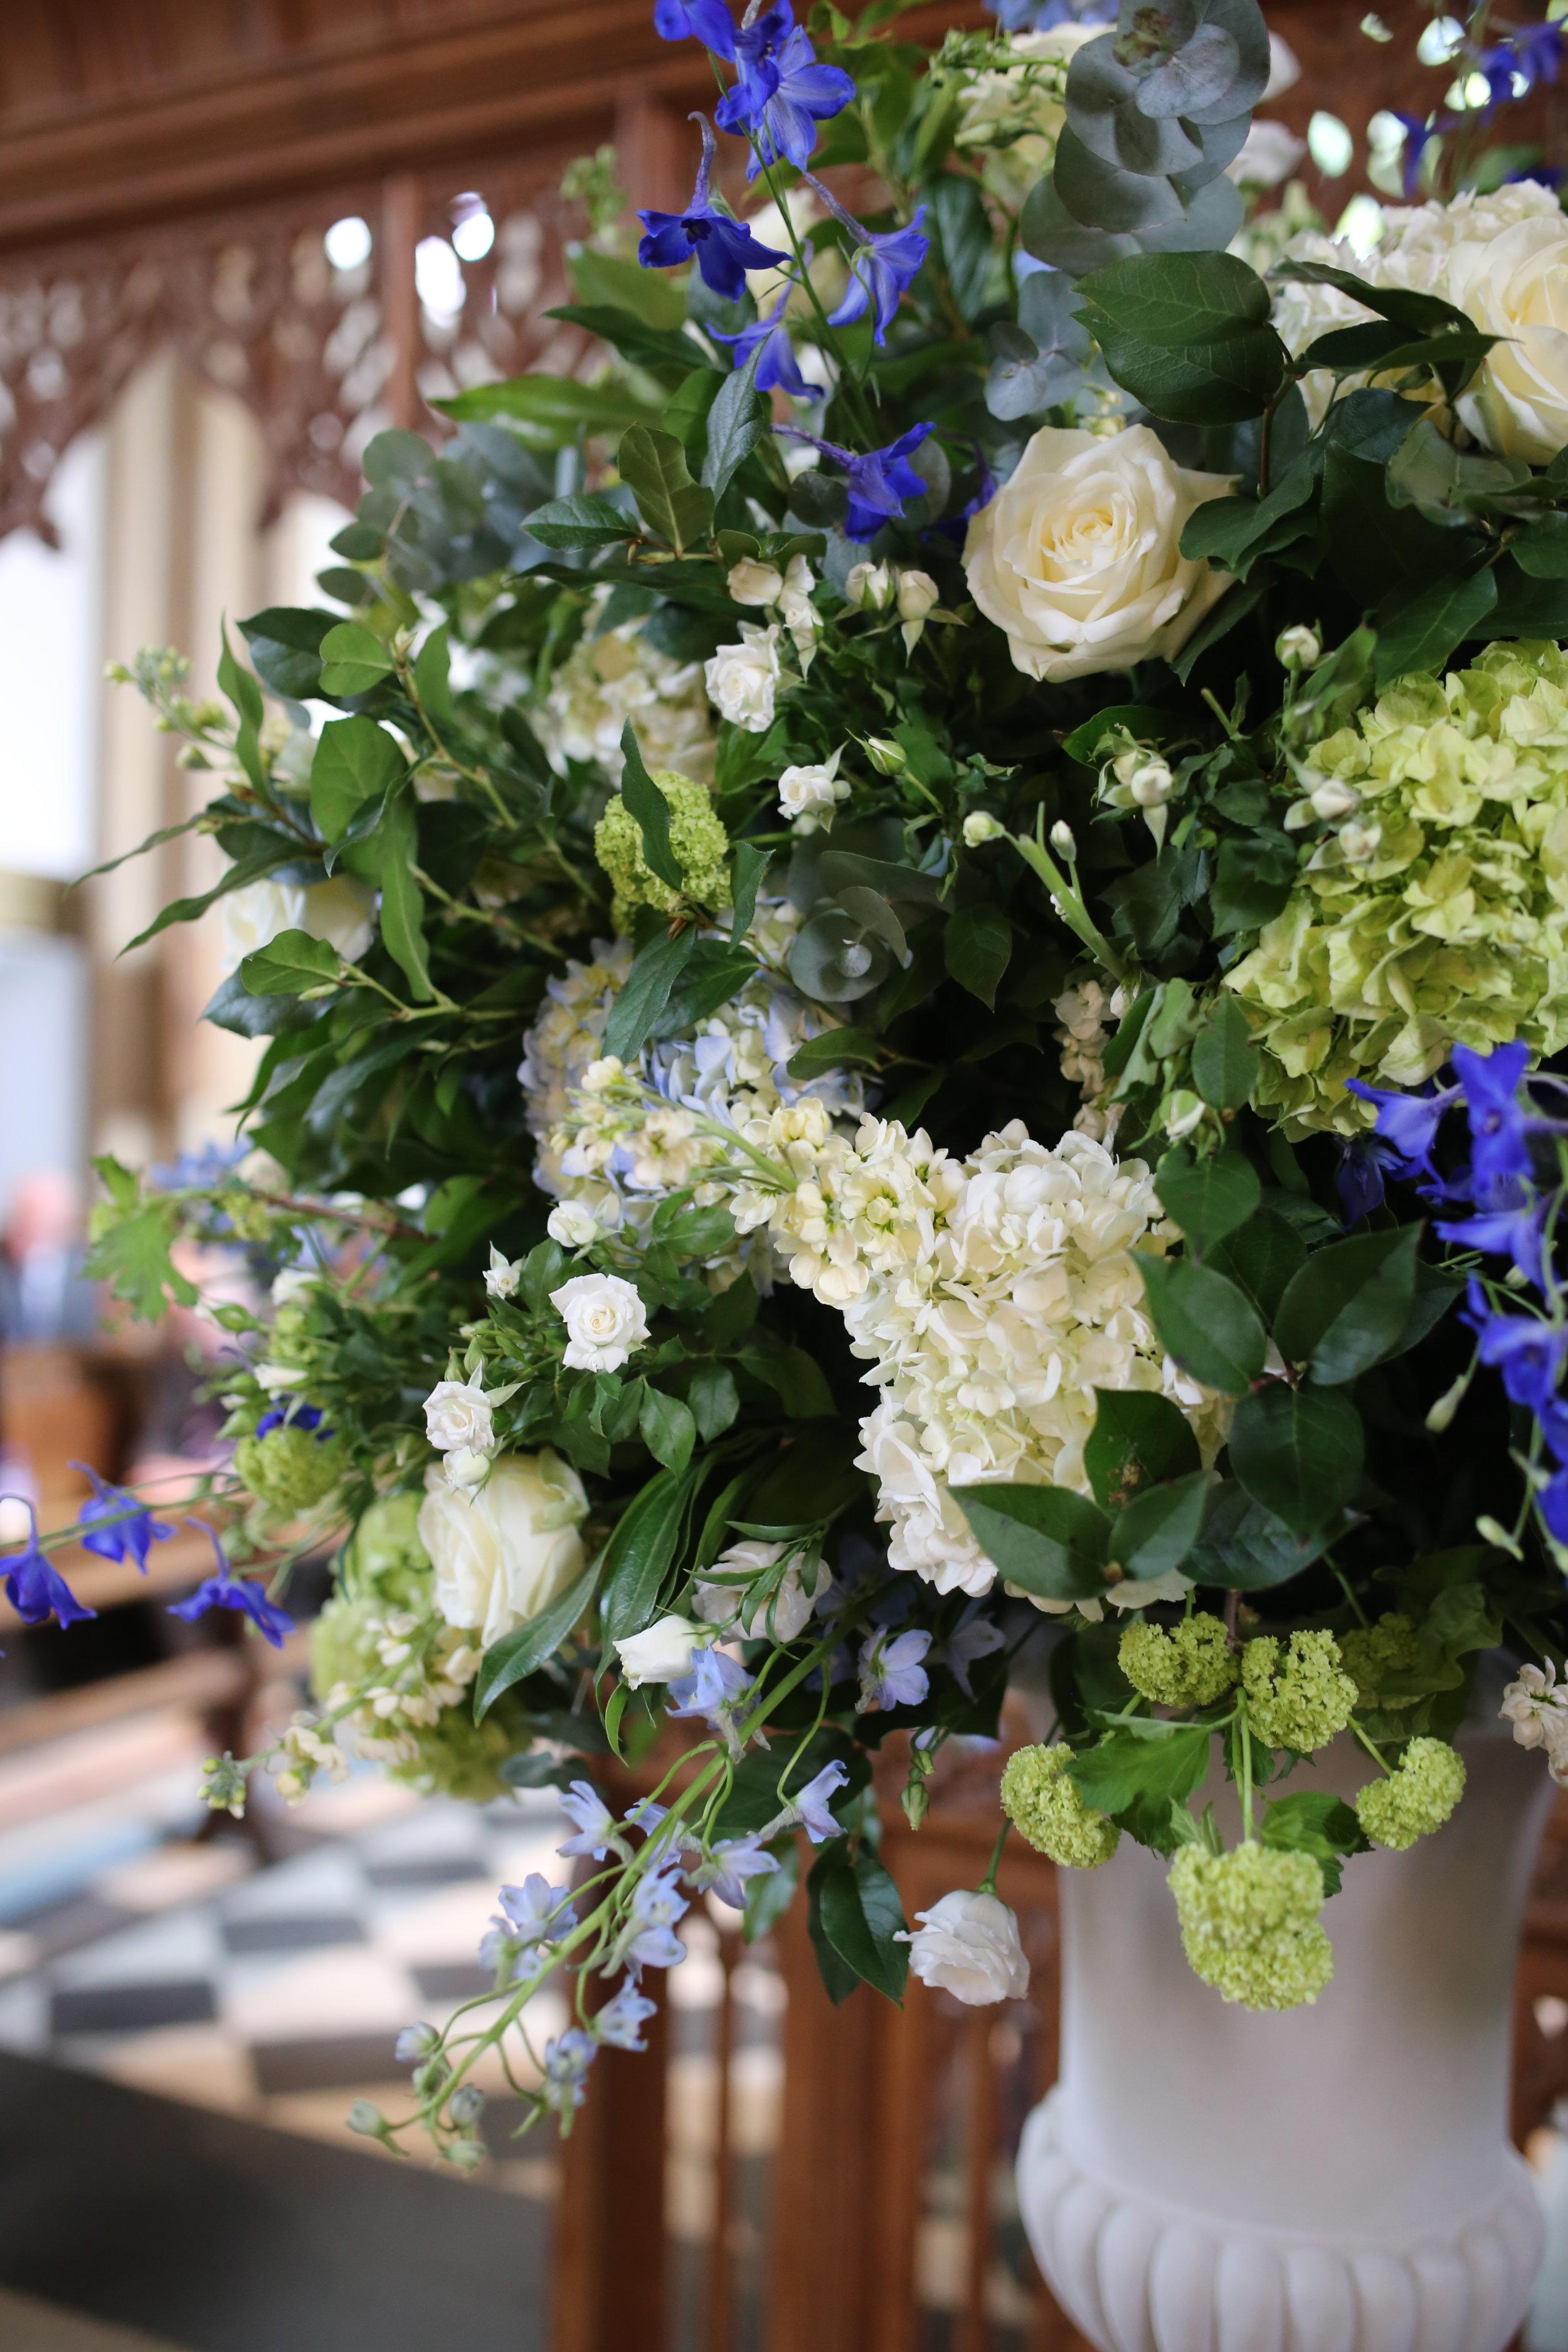 _MIRIAM_FAITH_WEDDING_FLOWERS_CEREMONY_URN_CHURCH_PEDESTAL_BLUE_WHITE_GREEN.JPG